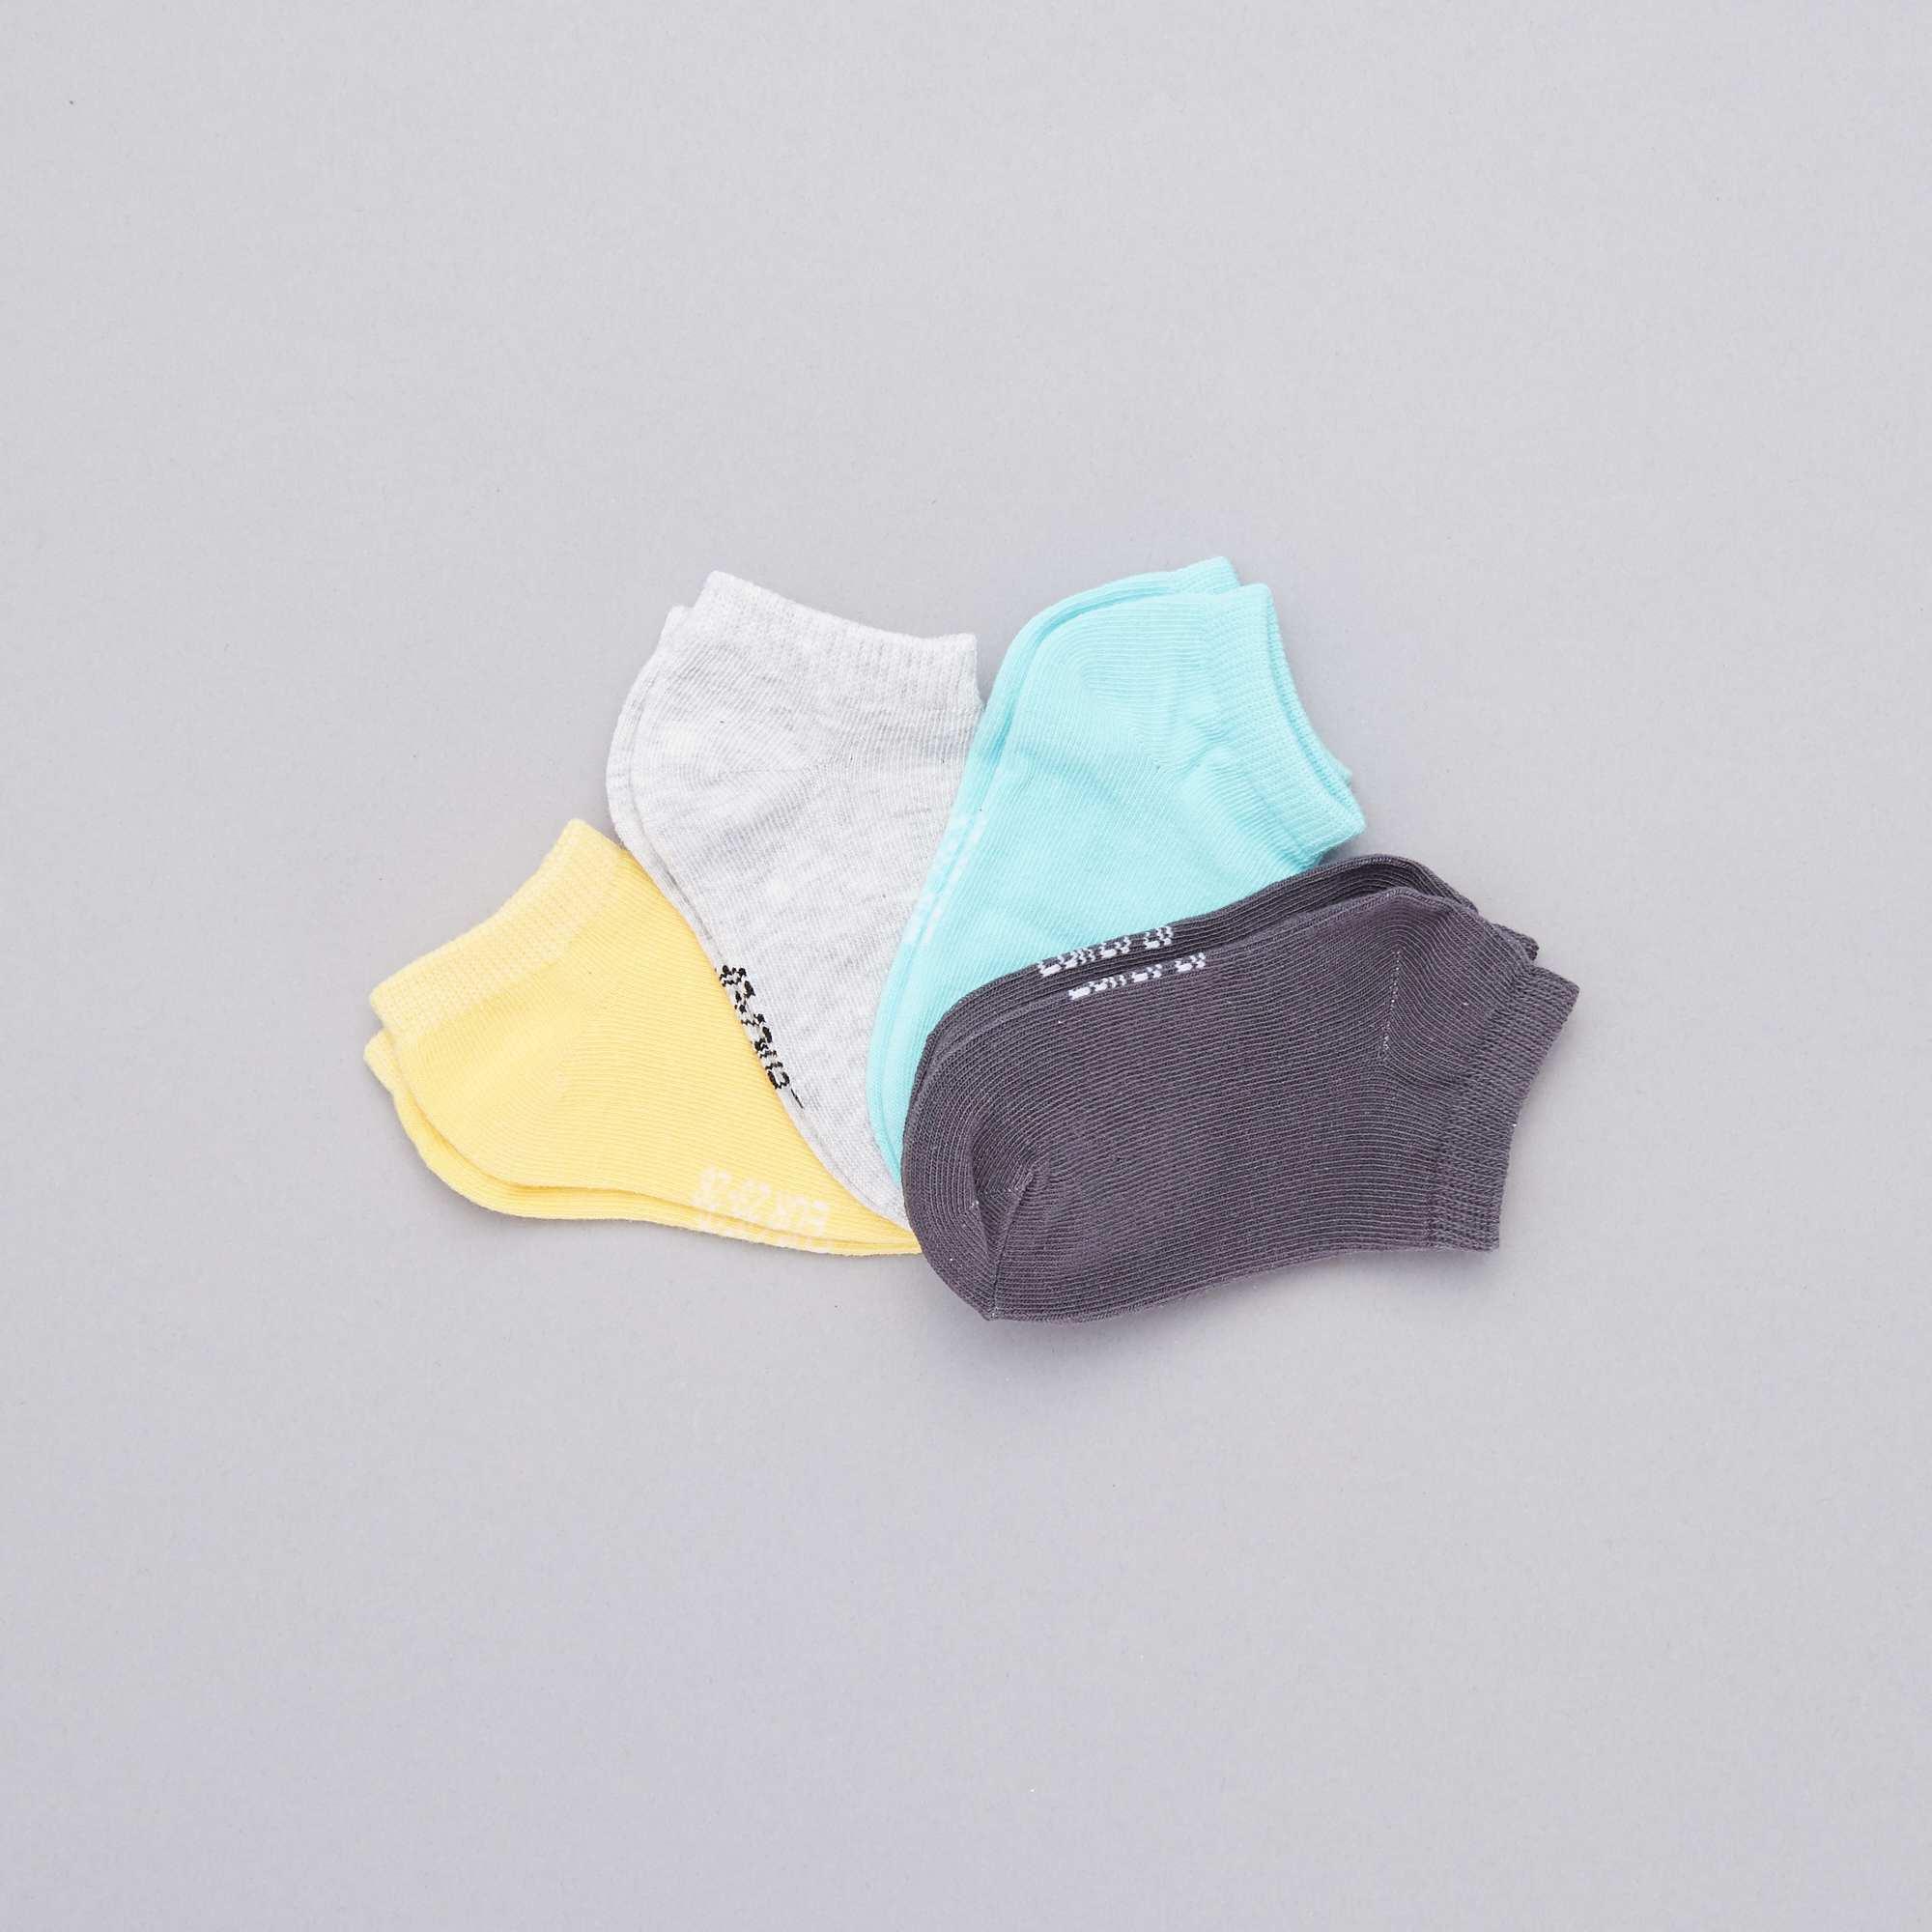 e8a658eede8 Pack de 4 pares de calcetines invisibles Chico - GRIS - Kiabi - 4